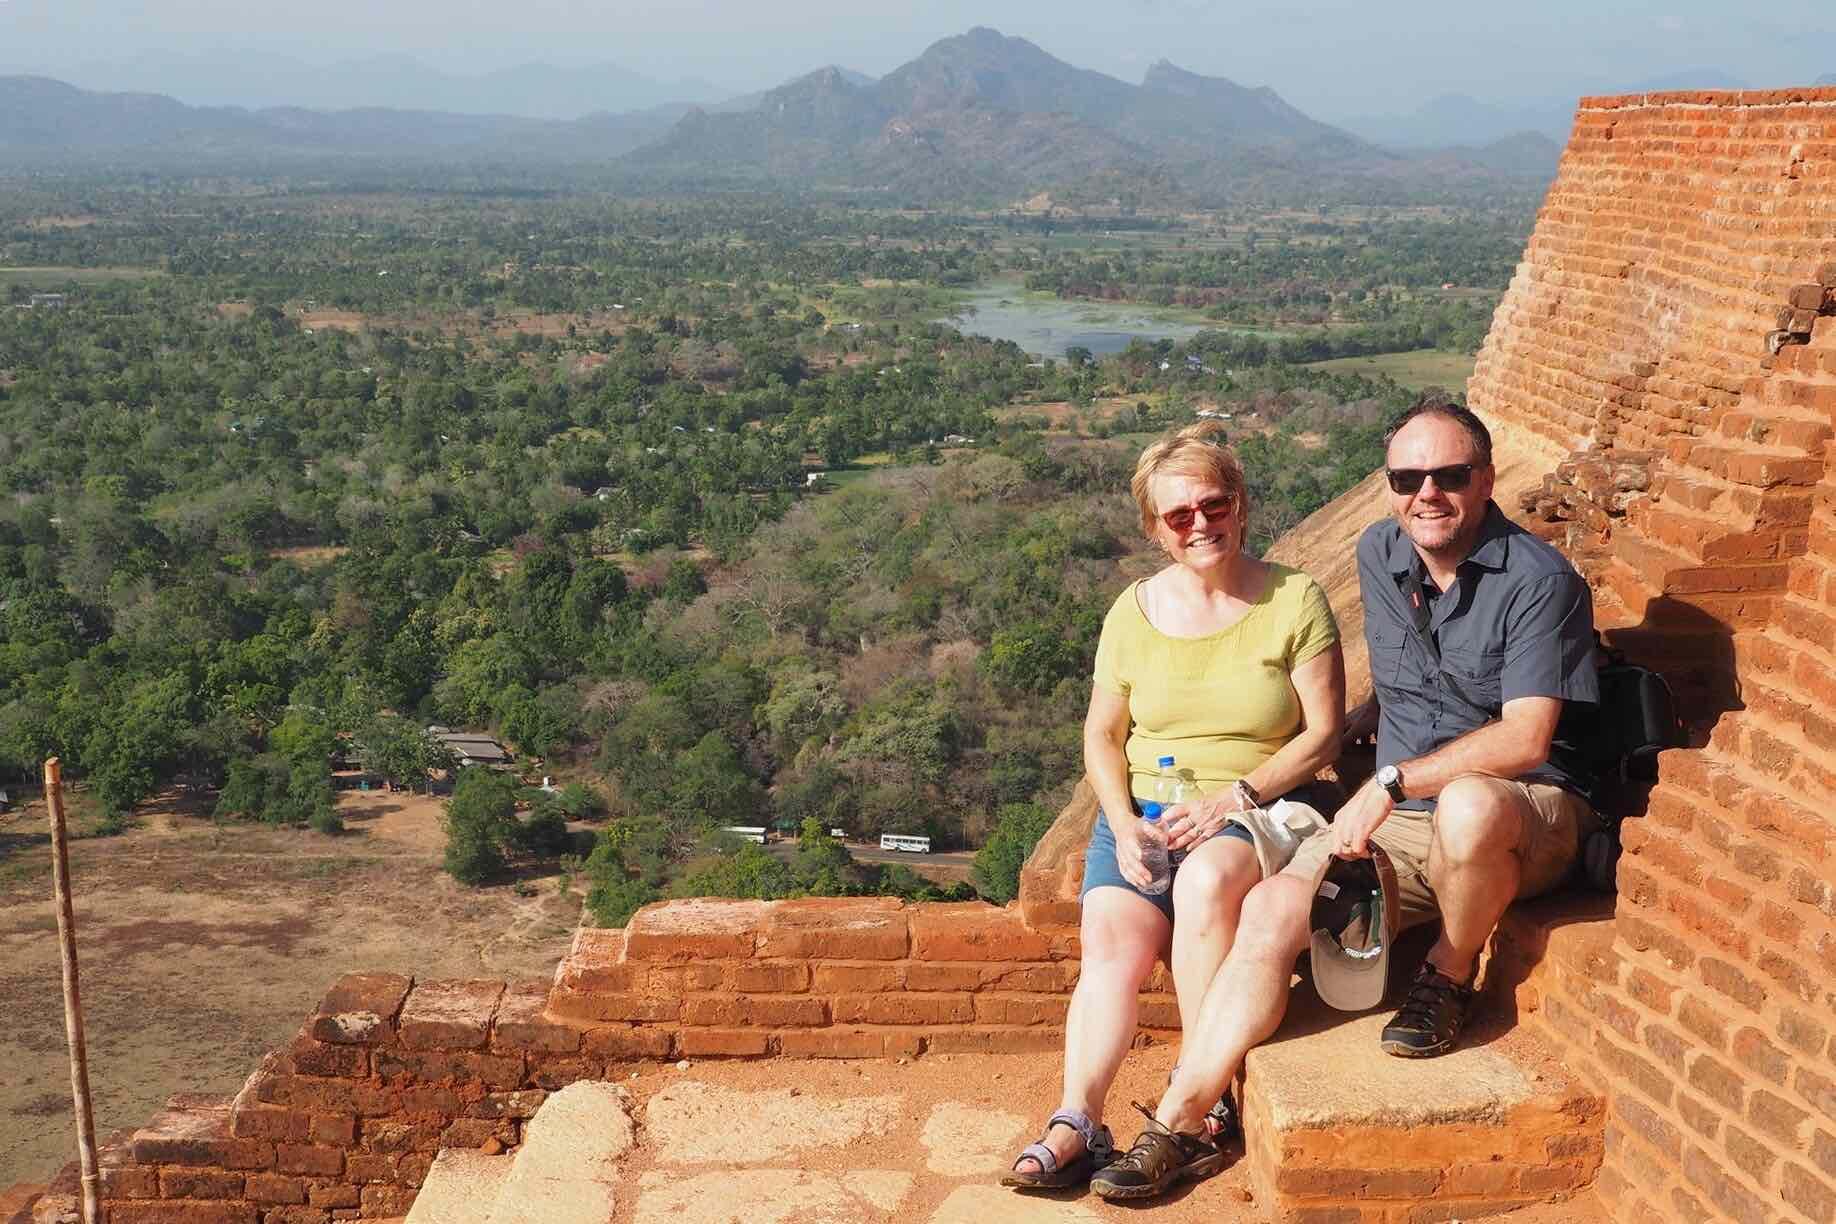 sri-lanka-sigiriya-rock-view-holiday-review-feedback-invite-to-paradise-quentin-kate-hulm.jpg